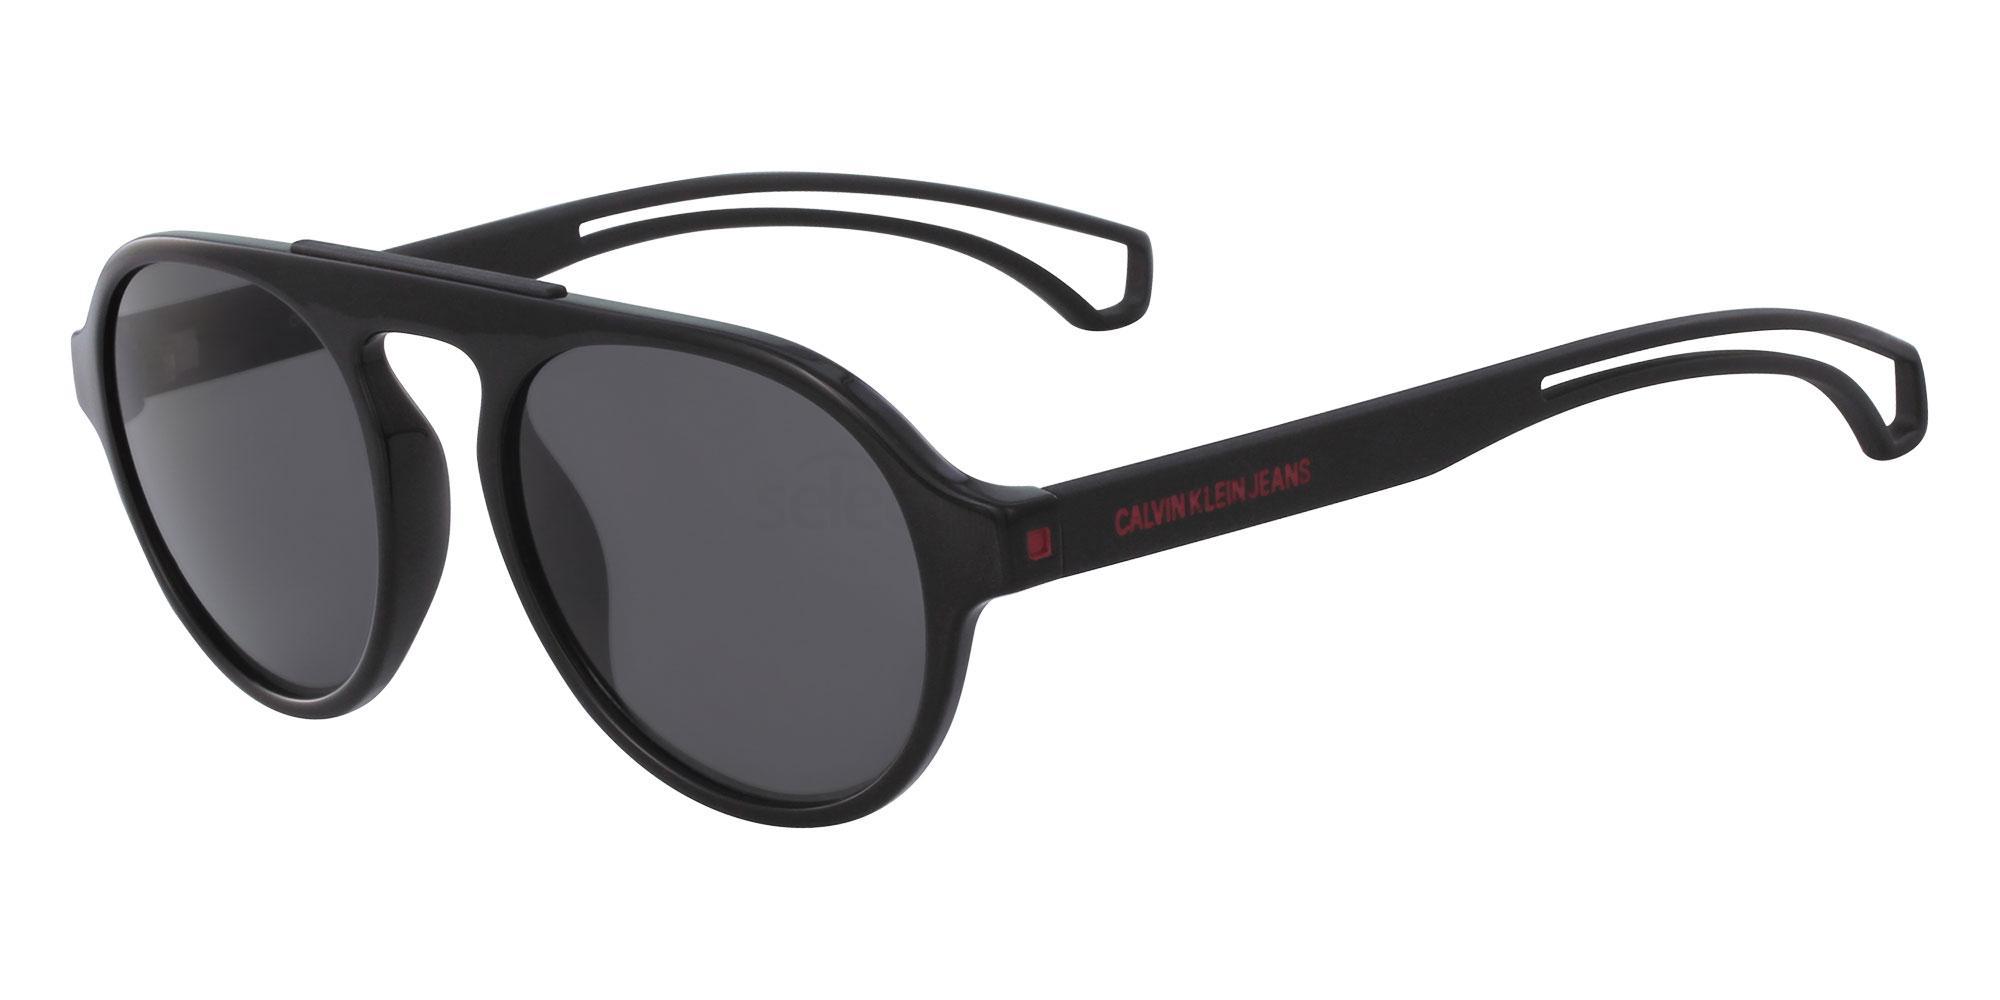 001 CKJ19502S Sunglasses, Calvin Klein Jeans